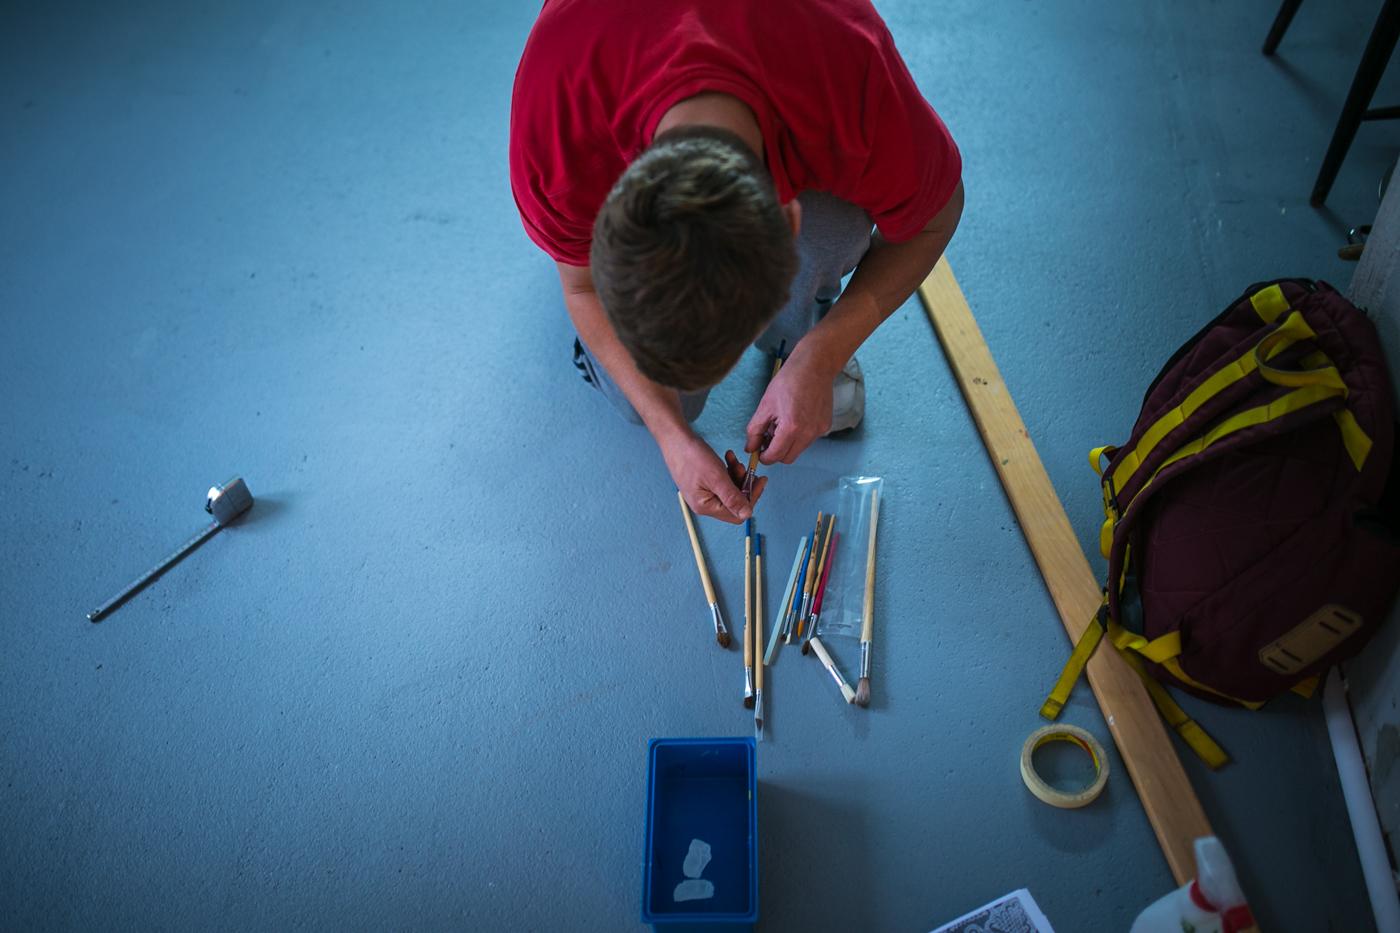 Pripremanje olitiga slaganje pribora za rad